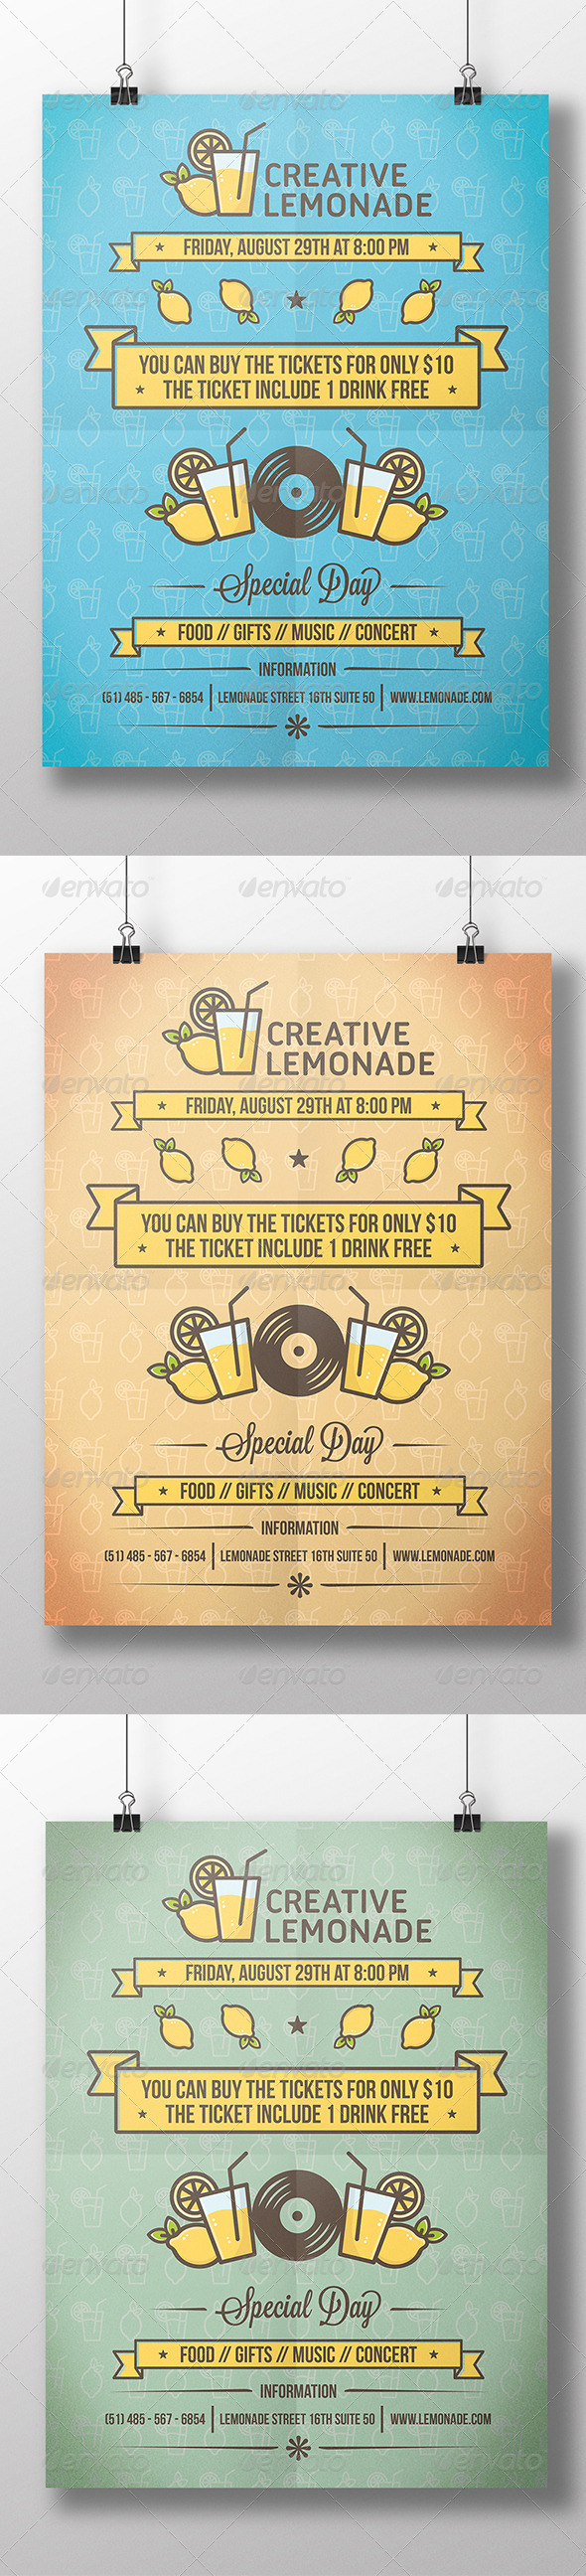 GraphicRiver Lemonade Cocktail Party Flyer 8612157